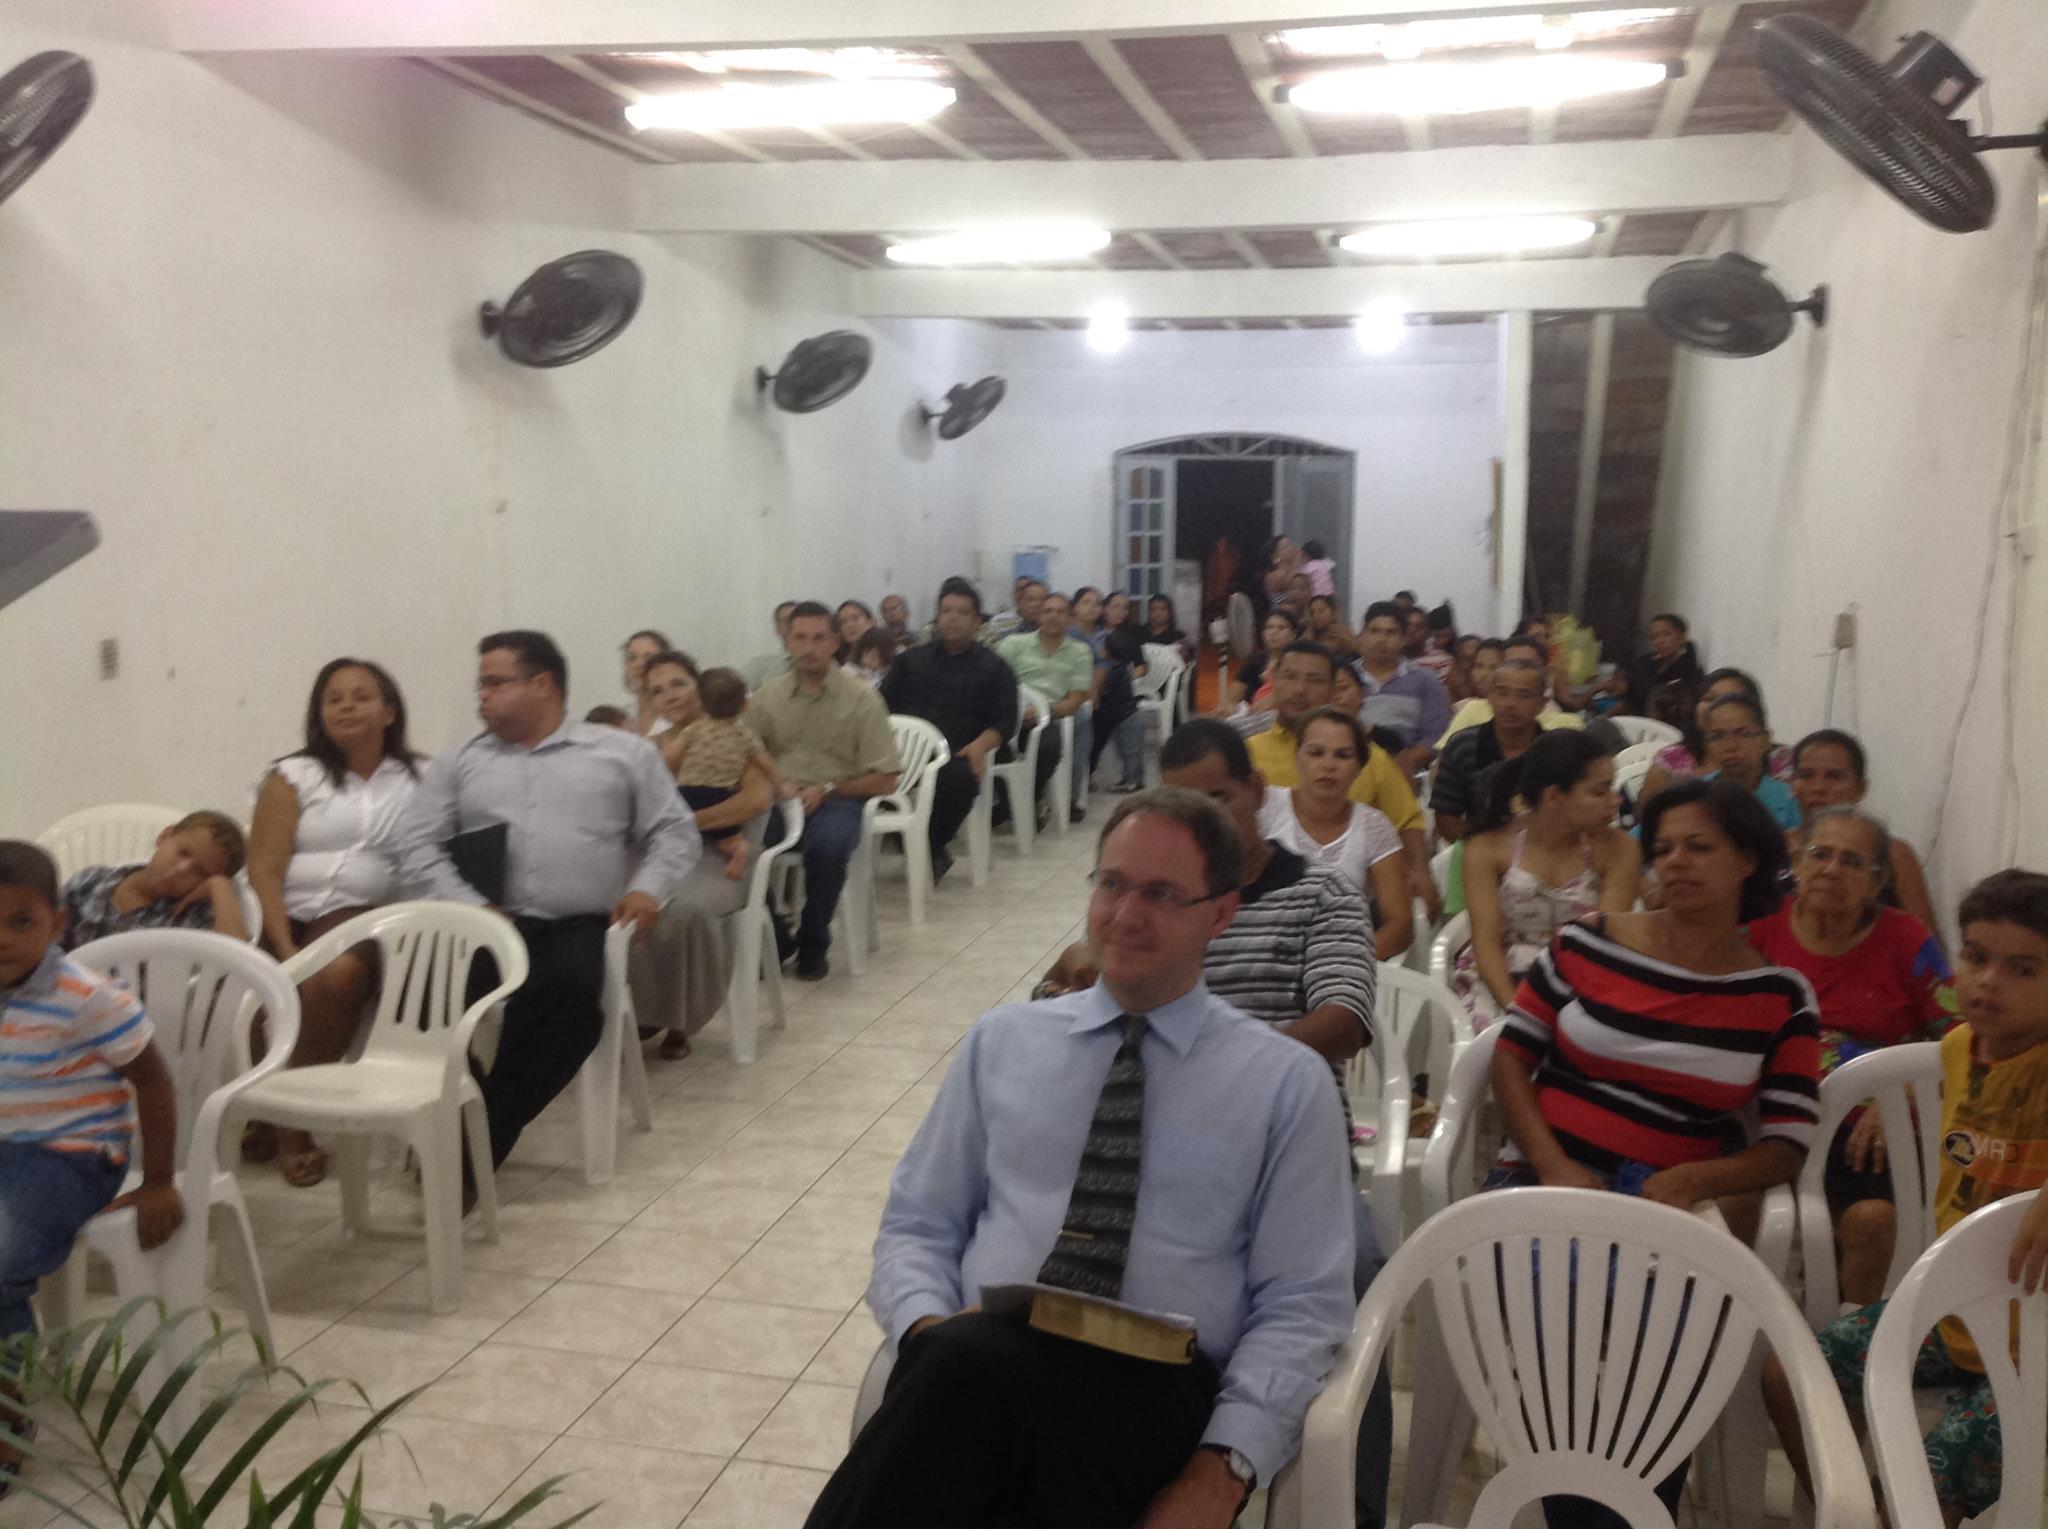 Reformed congregation of Imbiribeira in Recife, Brazil